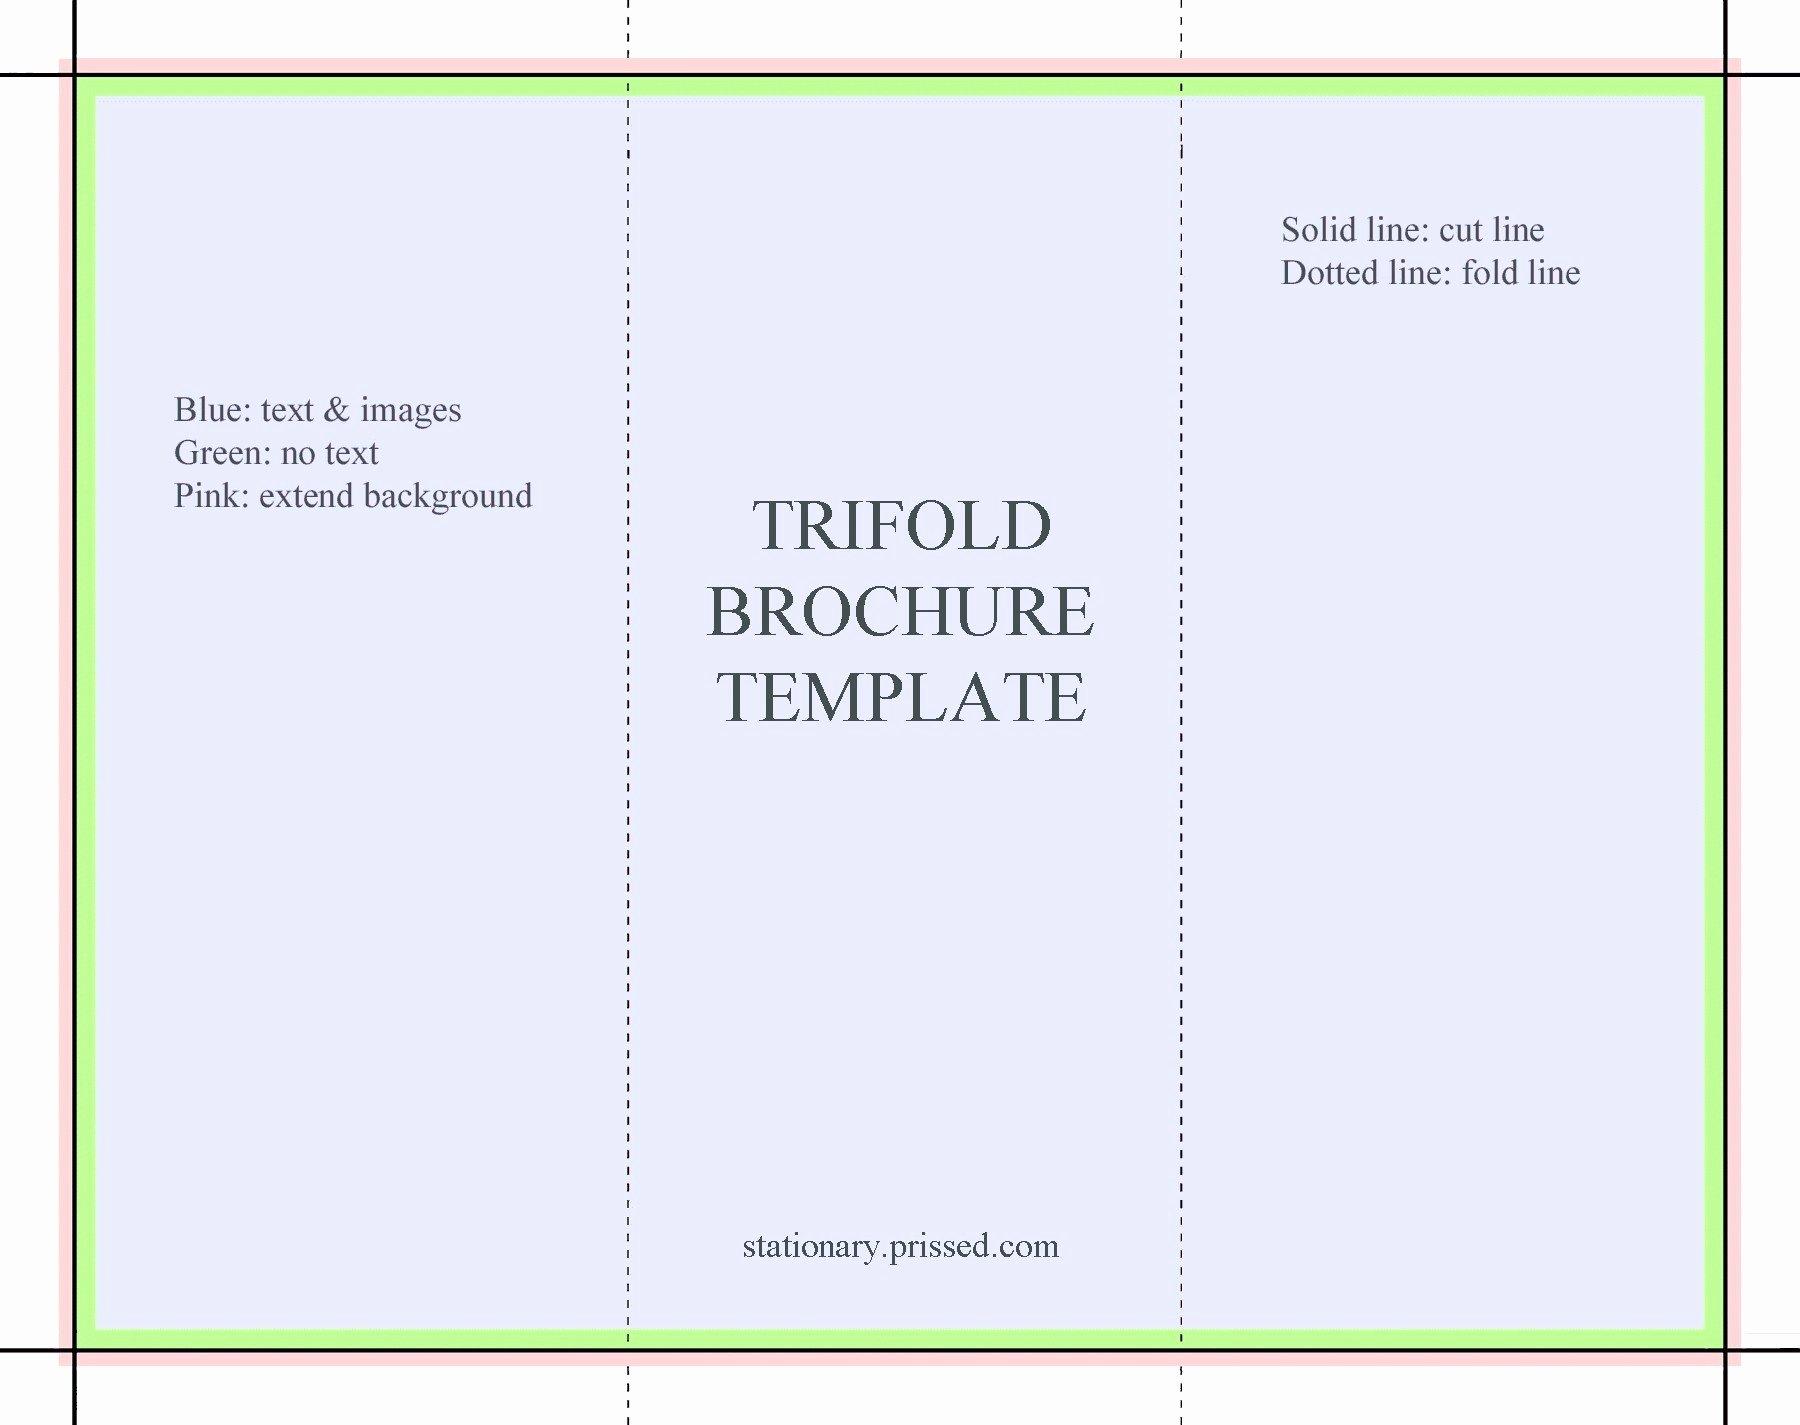 Advertisement Template Google Docs Unique Tri Fold Brochure Google Docs Template Reeviewer